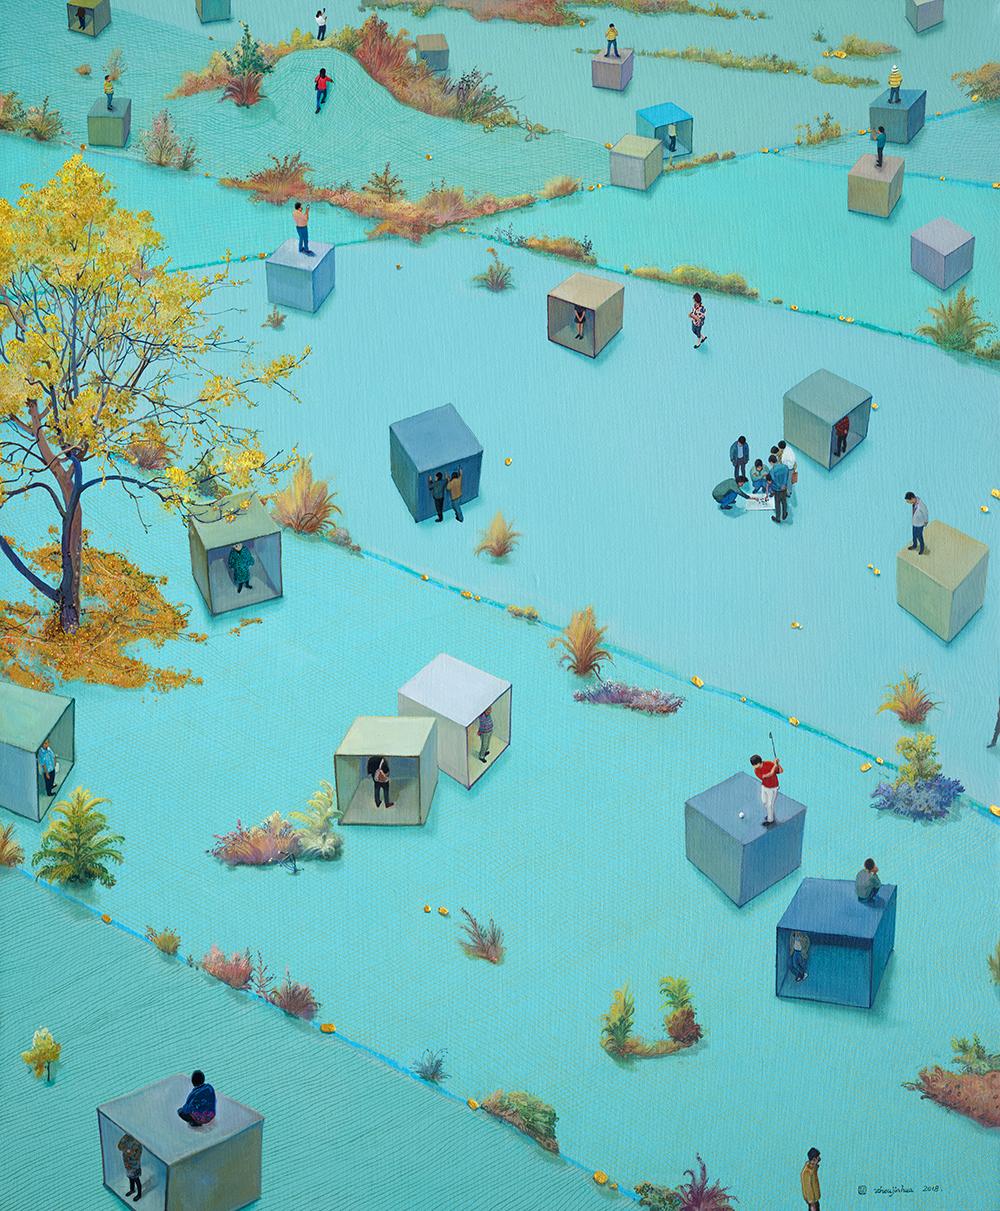 Zhou Jinhua 周金华, Autumn 秋天, 2018, Oil and acrylic on canvas 布面油彩、丙烯, 128 x 106 cm